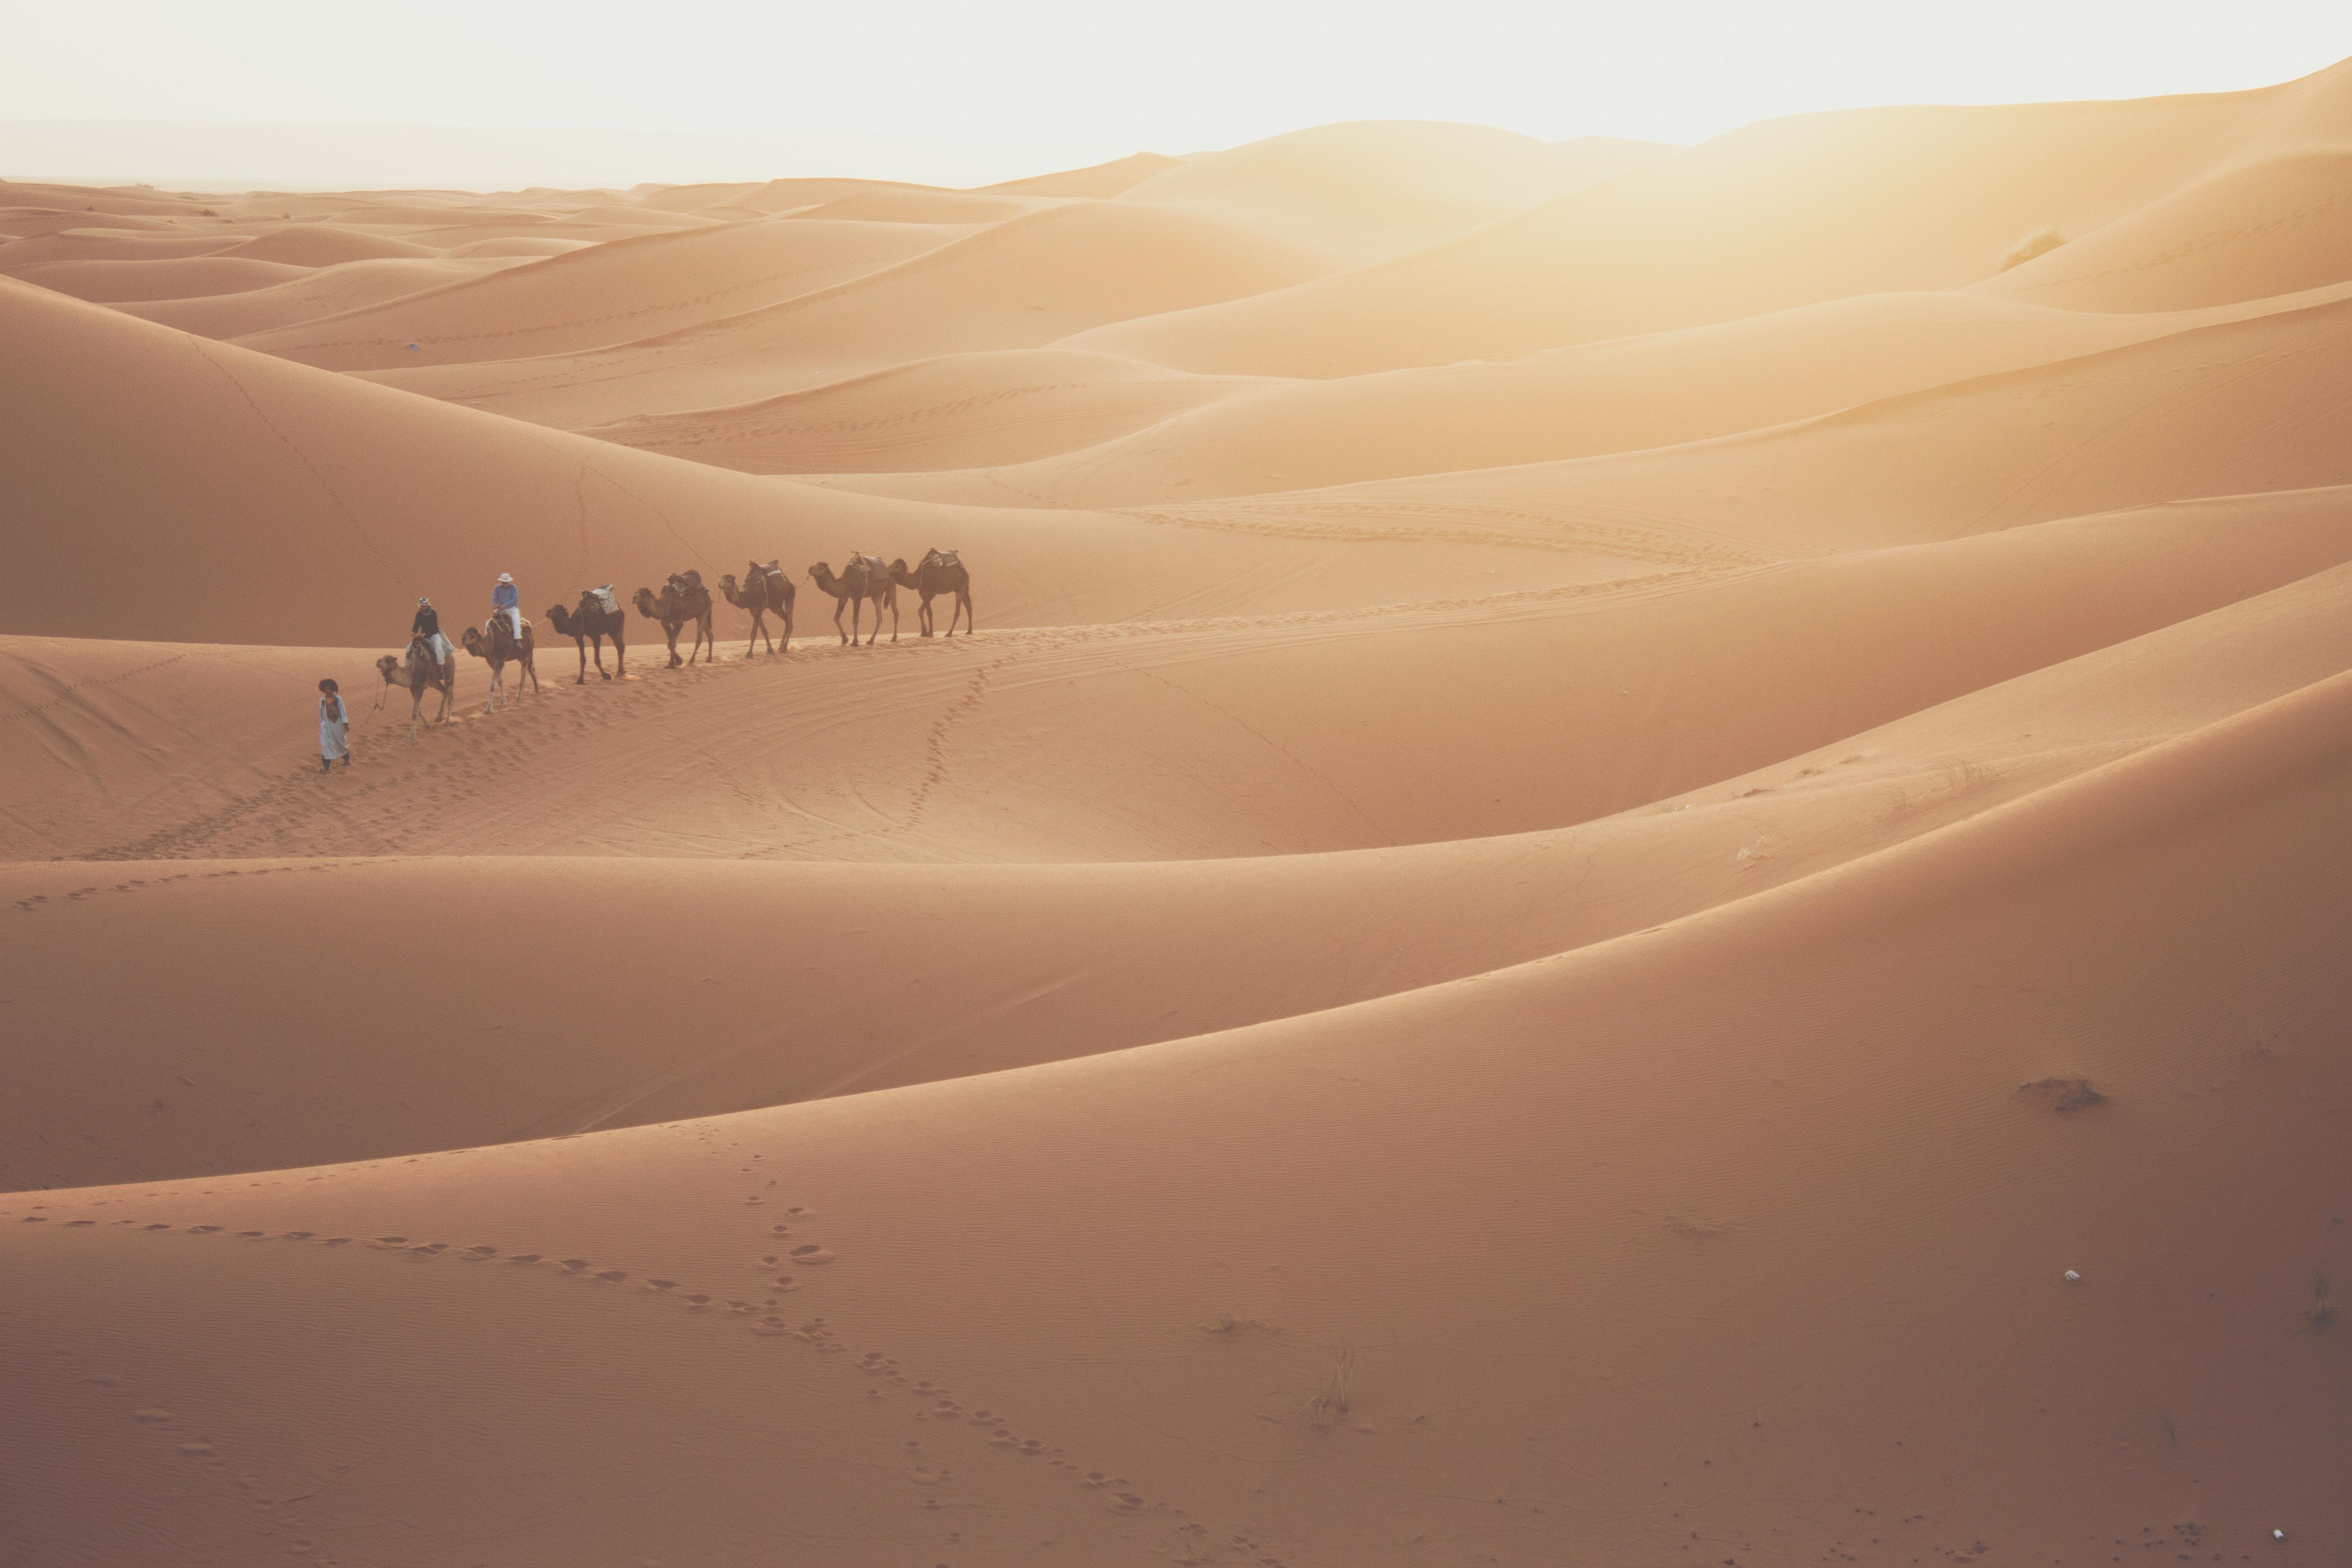 Destination image of Maroc